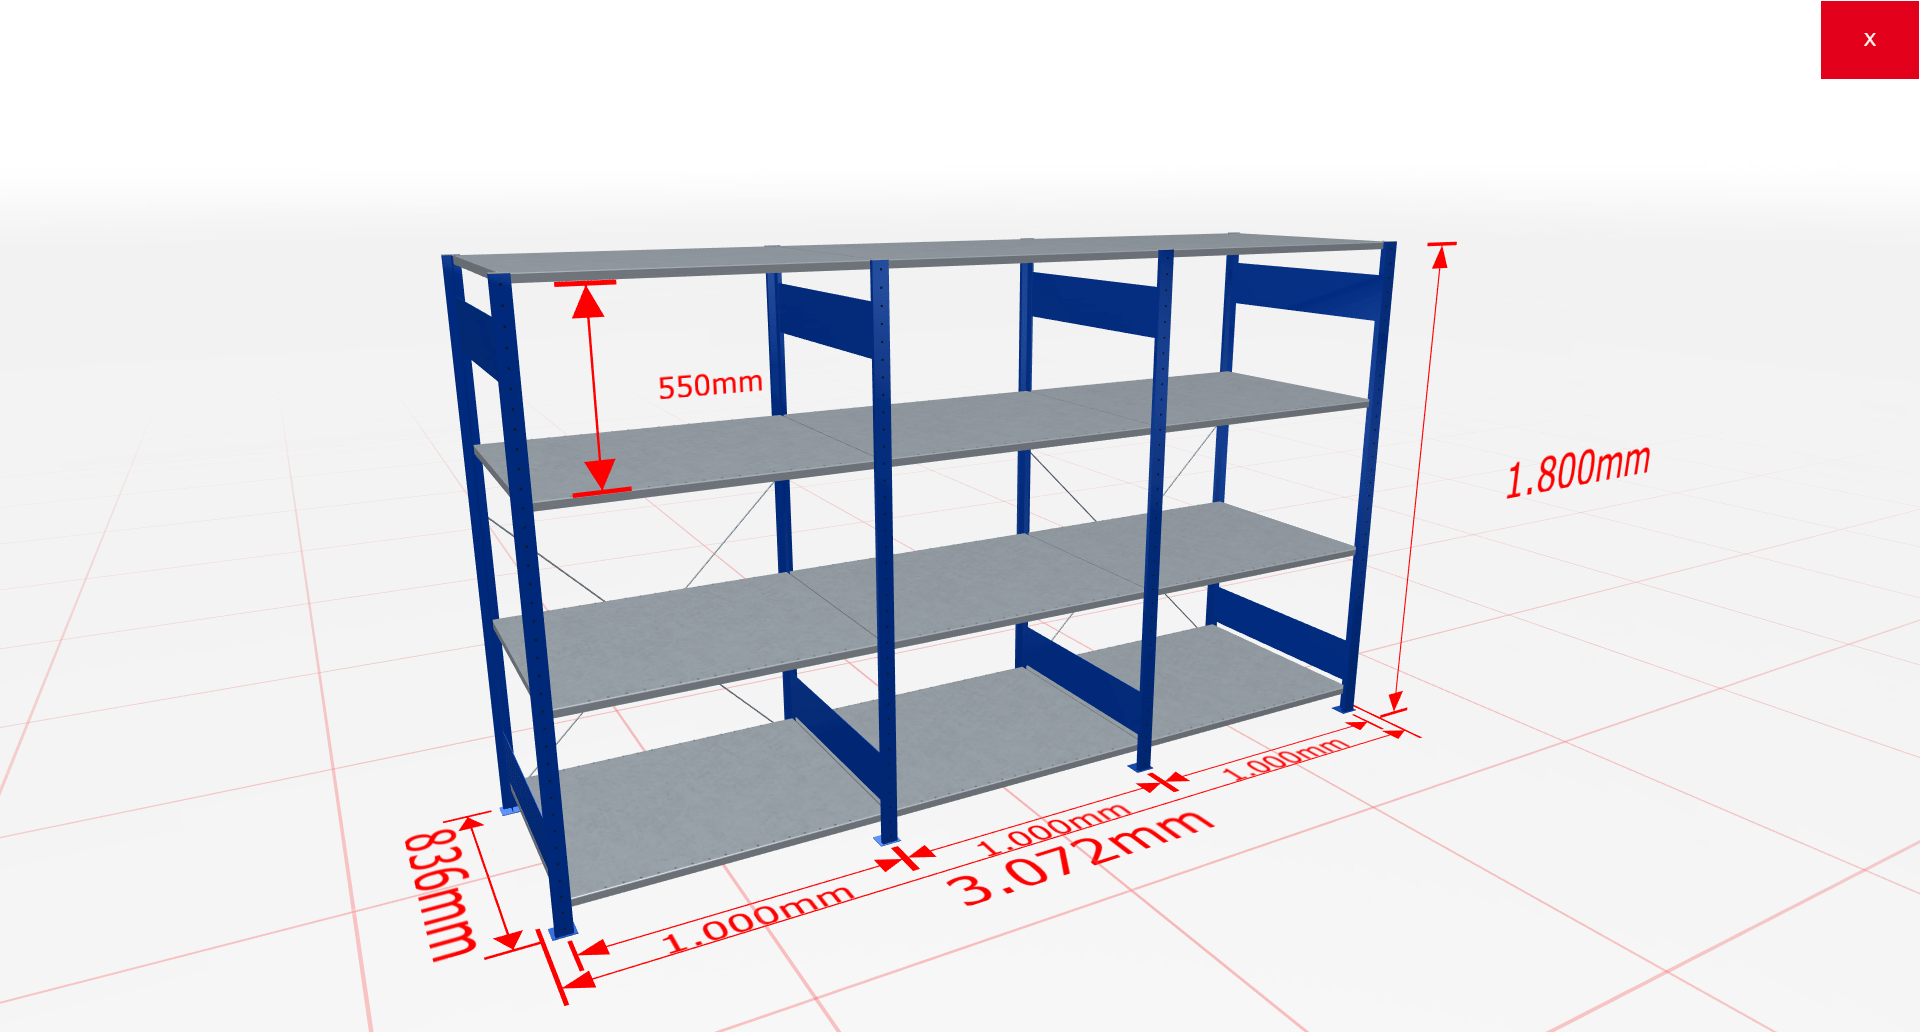 Fachbodenregal Komplettregal 1800x3072x800 mm (HxBxT) SCHULTE Lagertechnik blau 4 Ebenen  150 kg je Boden